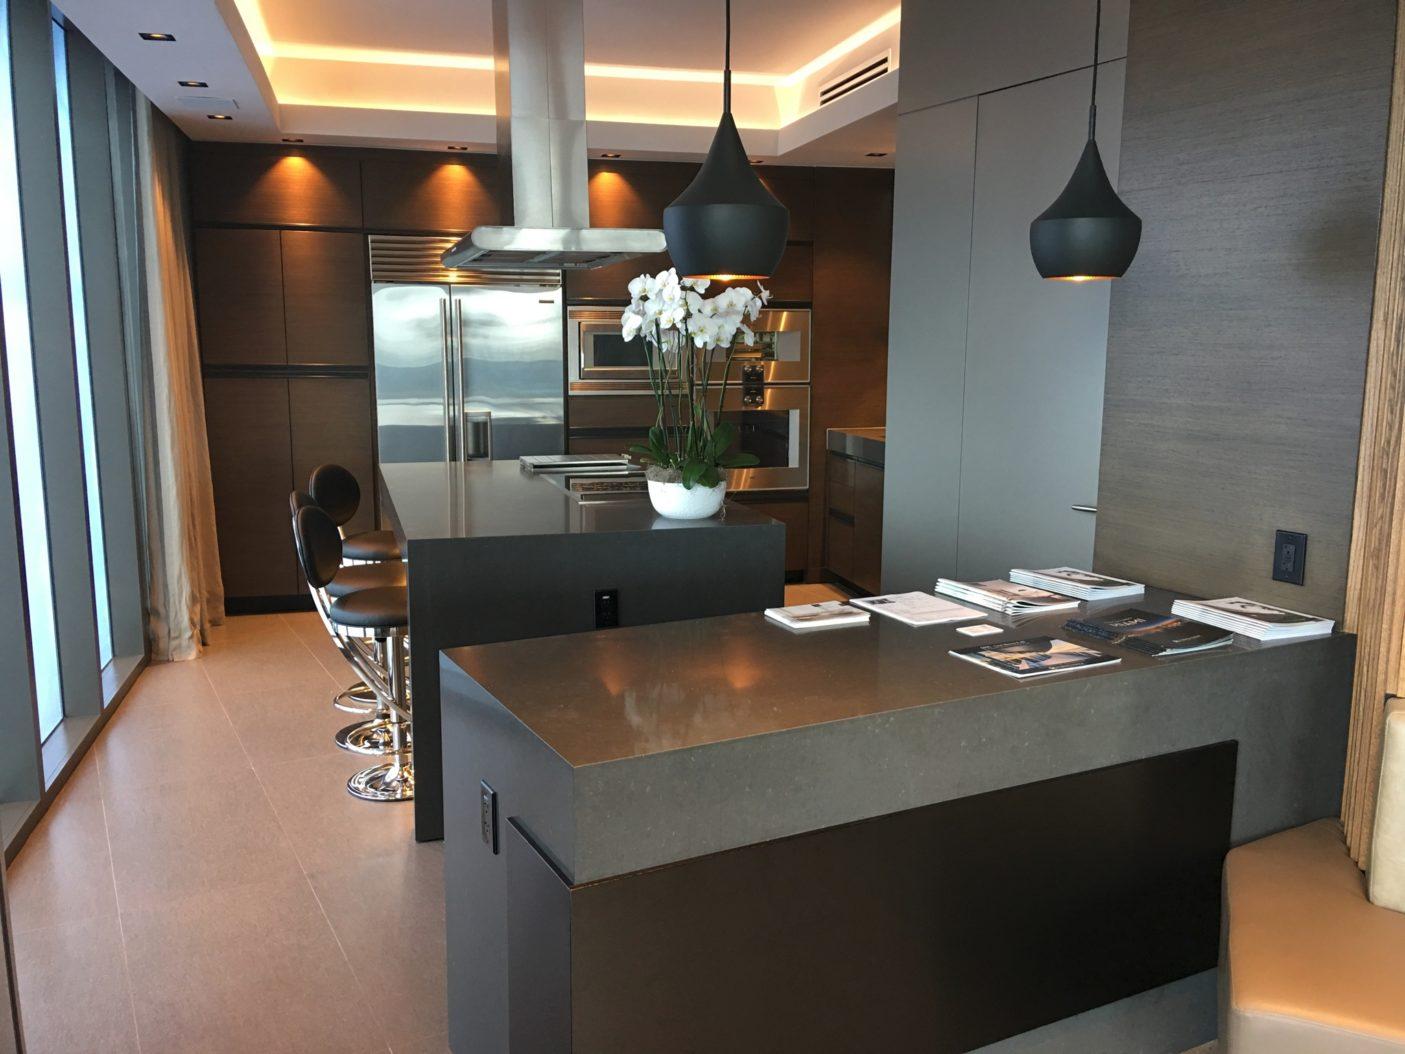 Kitchens-128.jpg